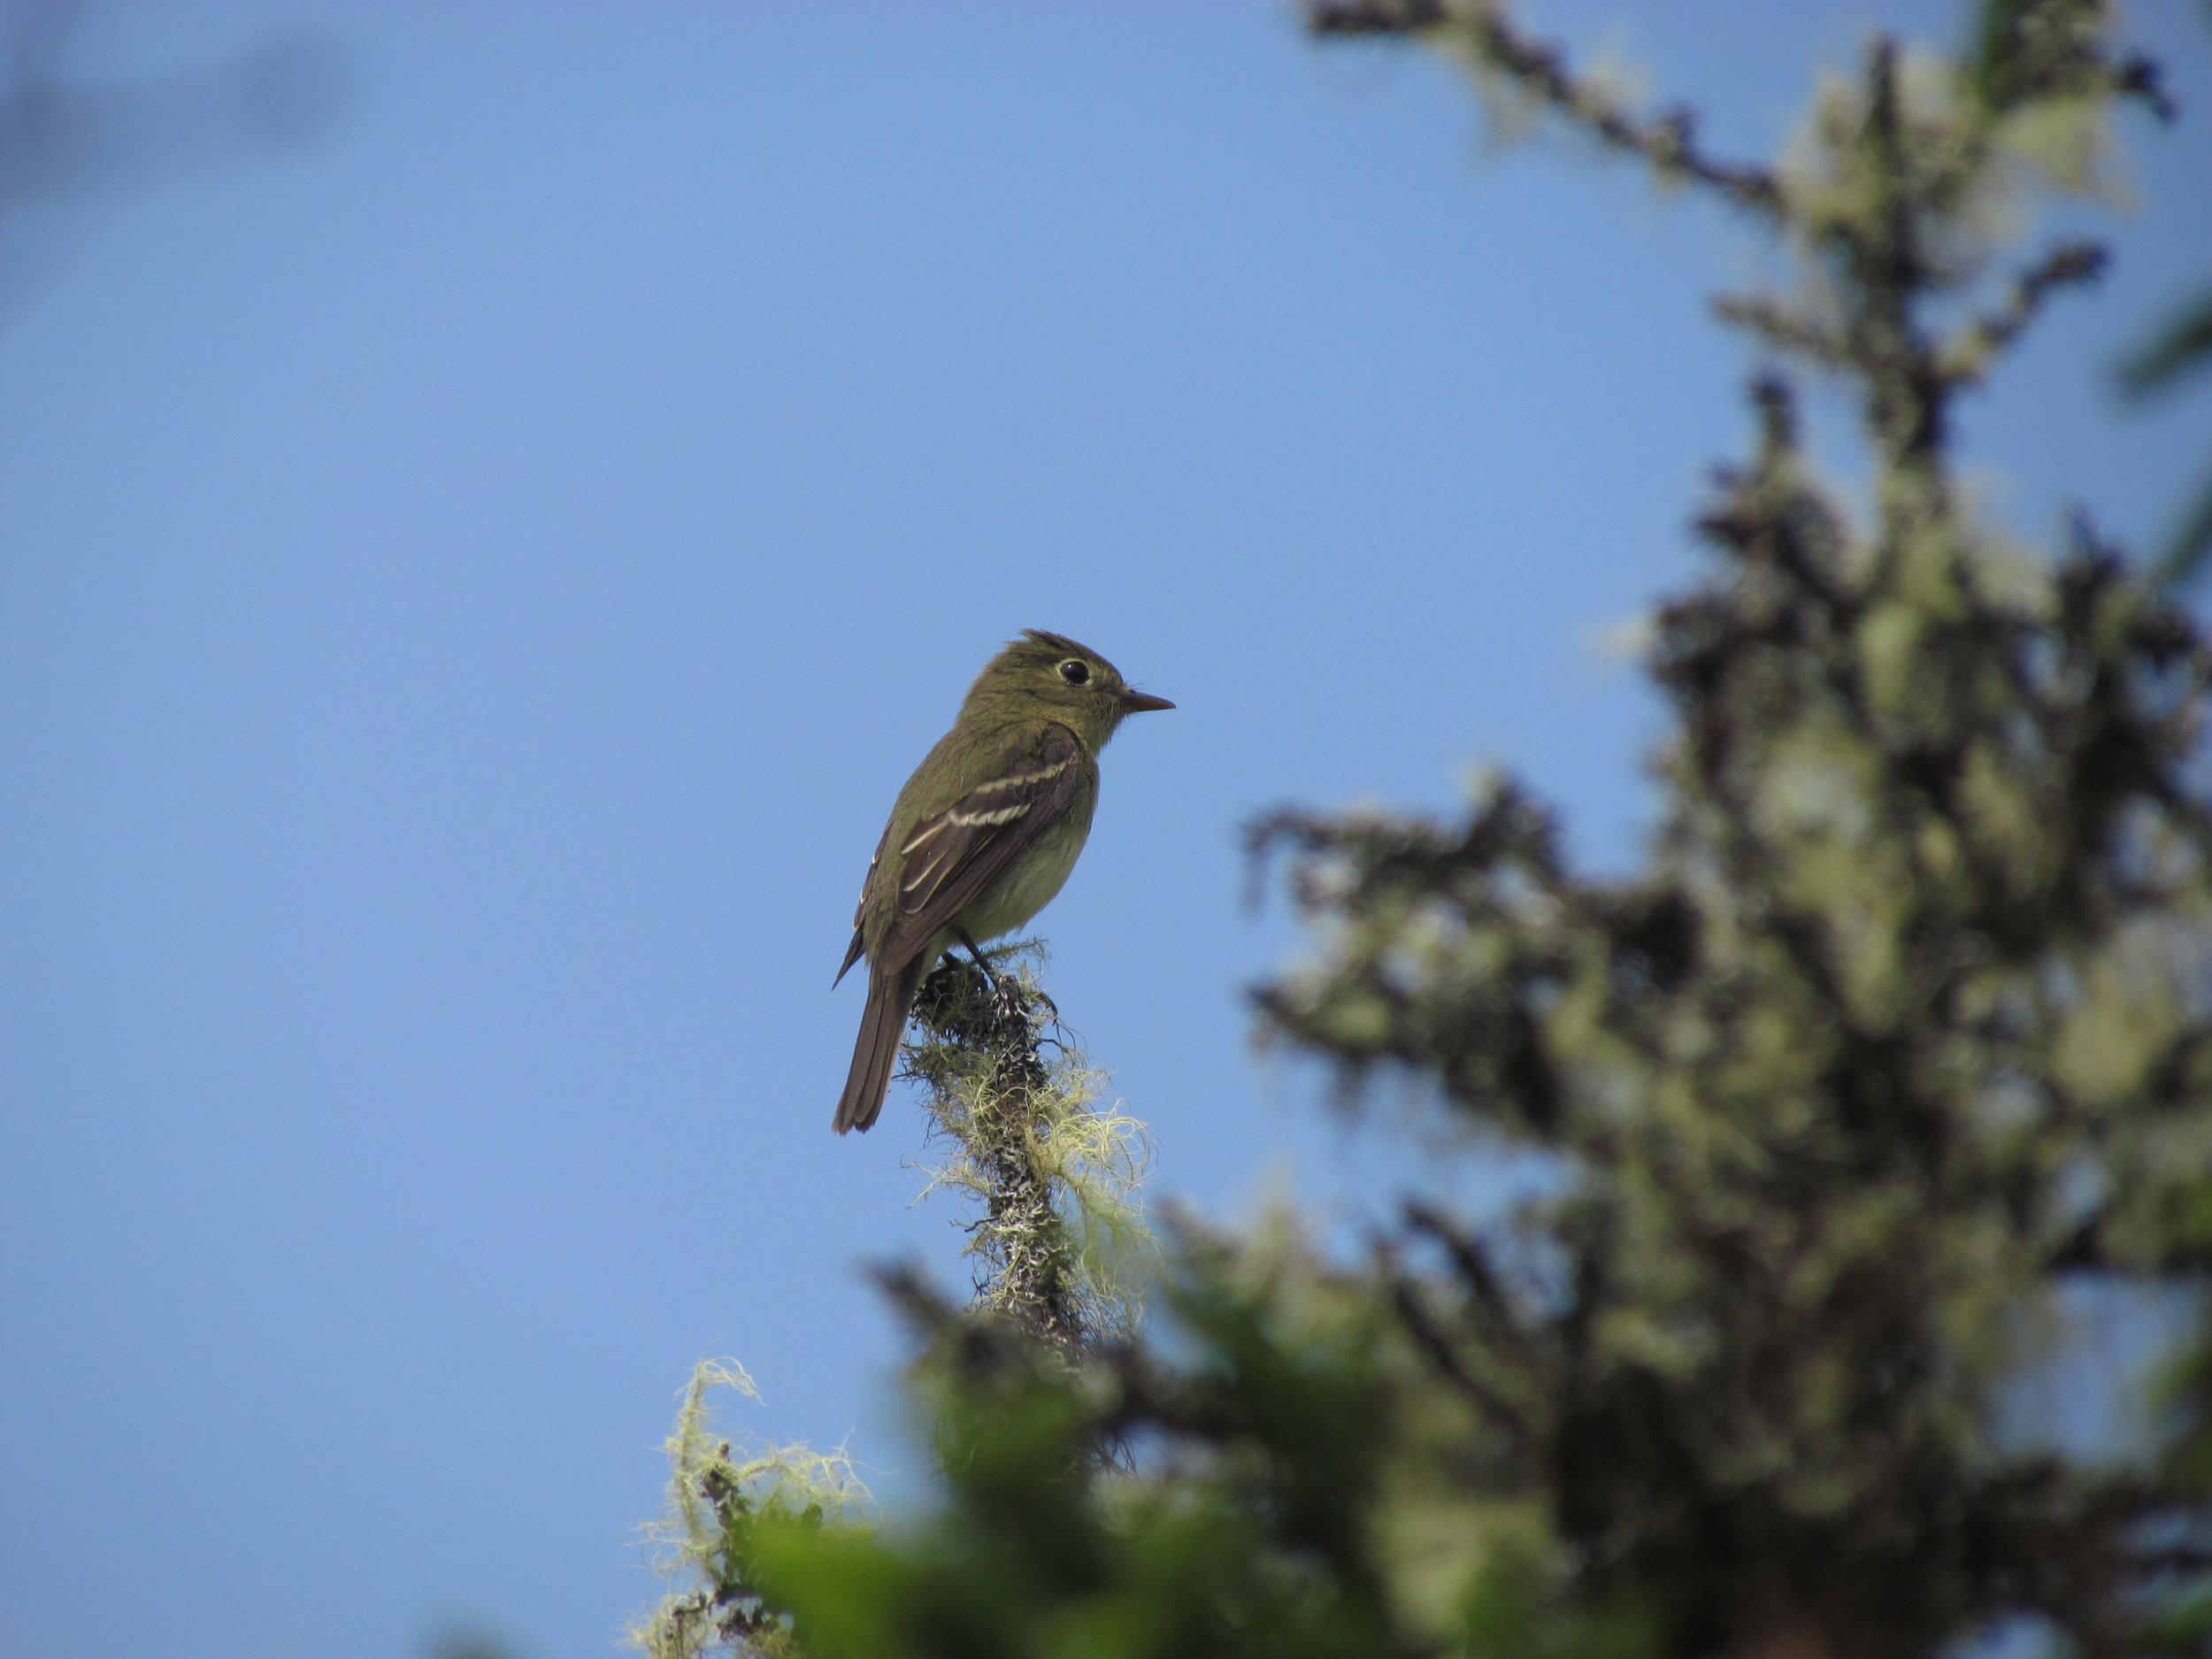 Yellow-bellied Flycatcher on Gerard Island